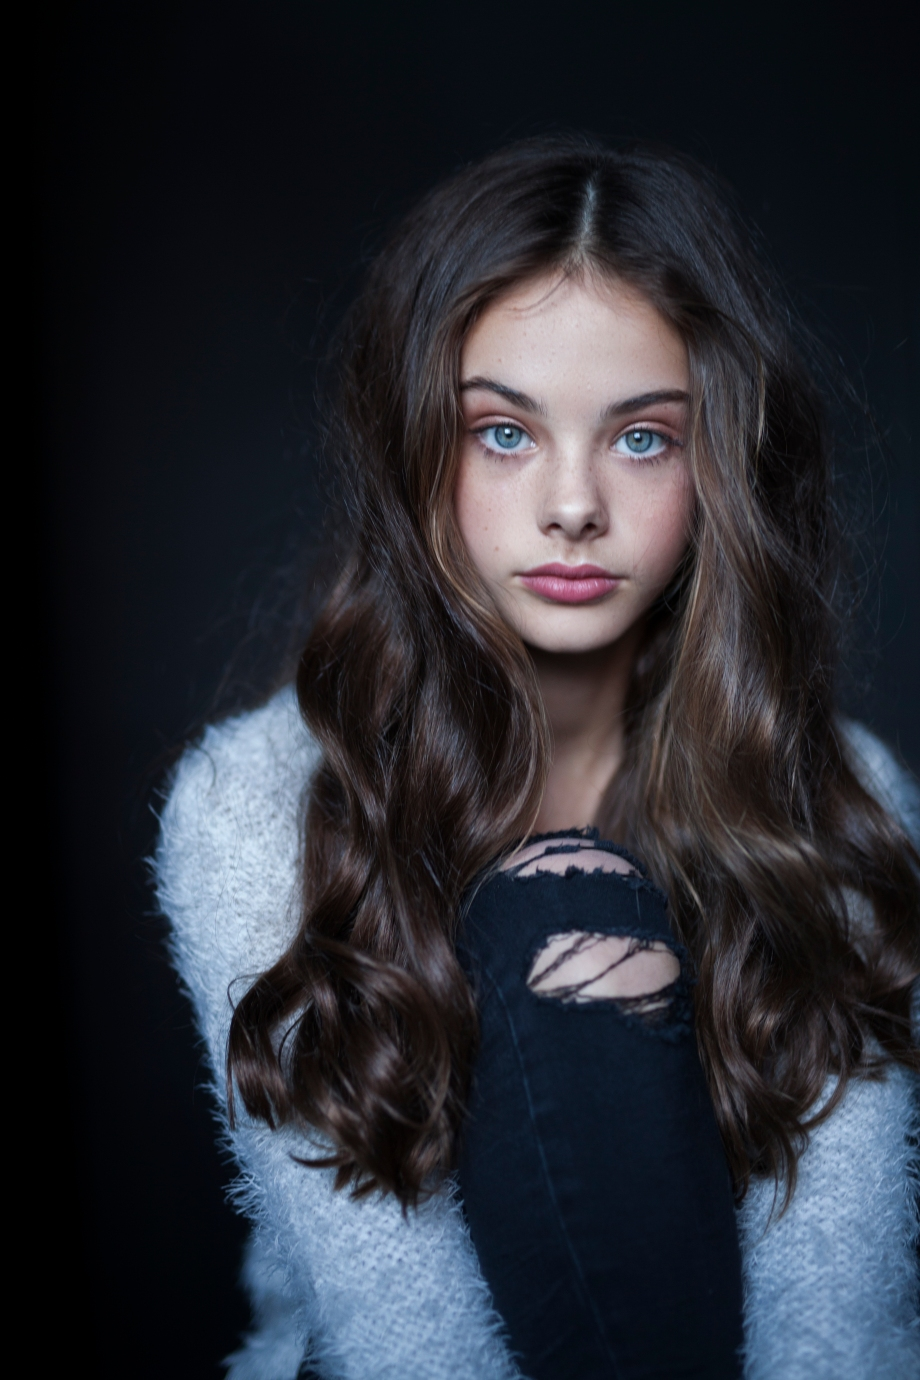 meika